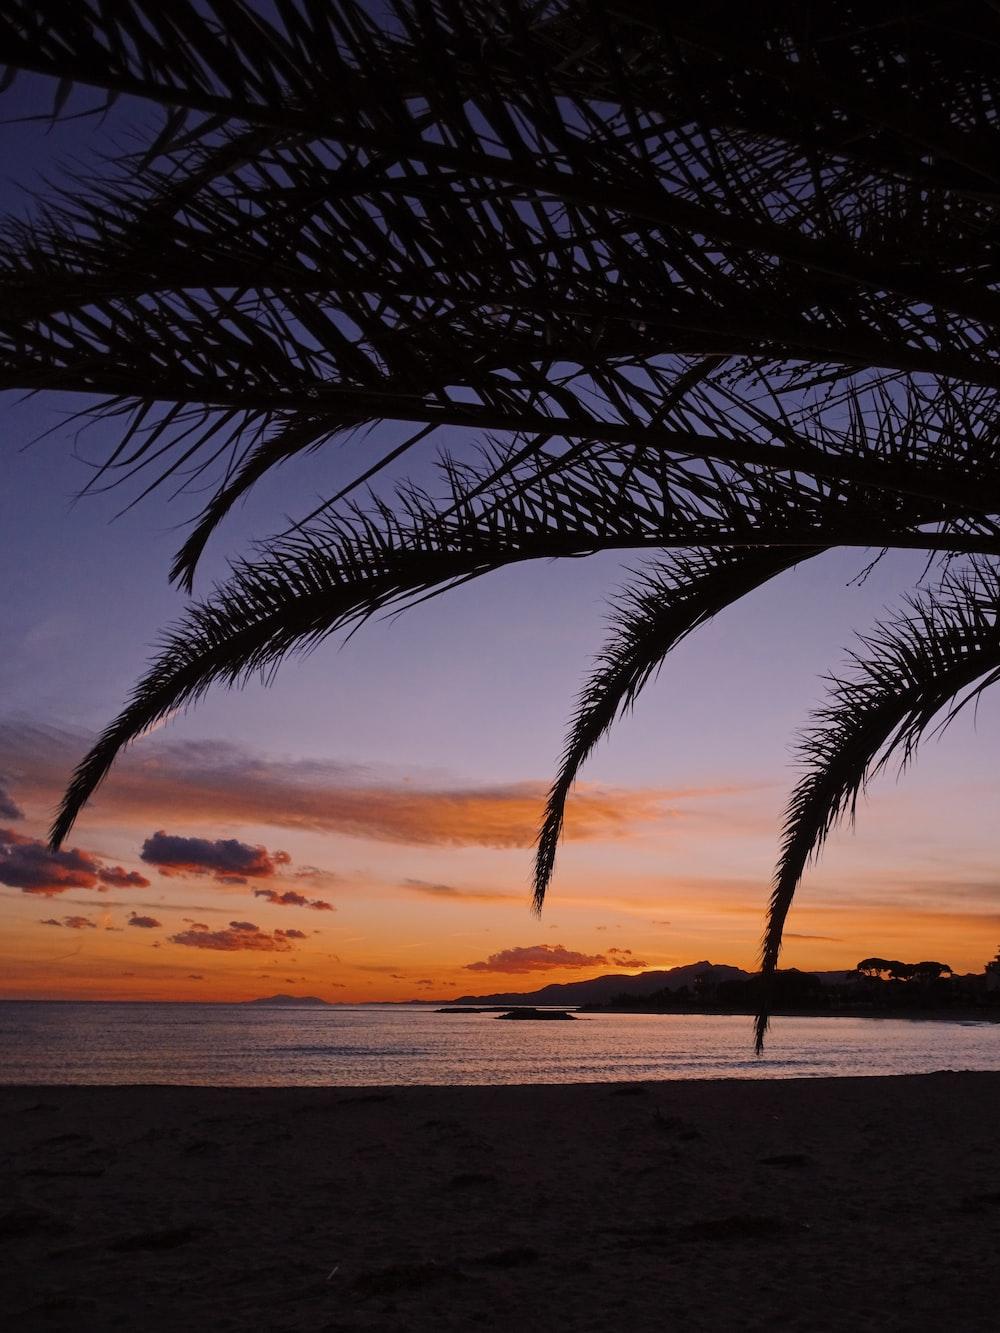 palm tree near sea during sunset